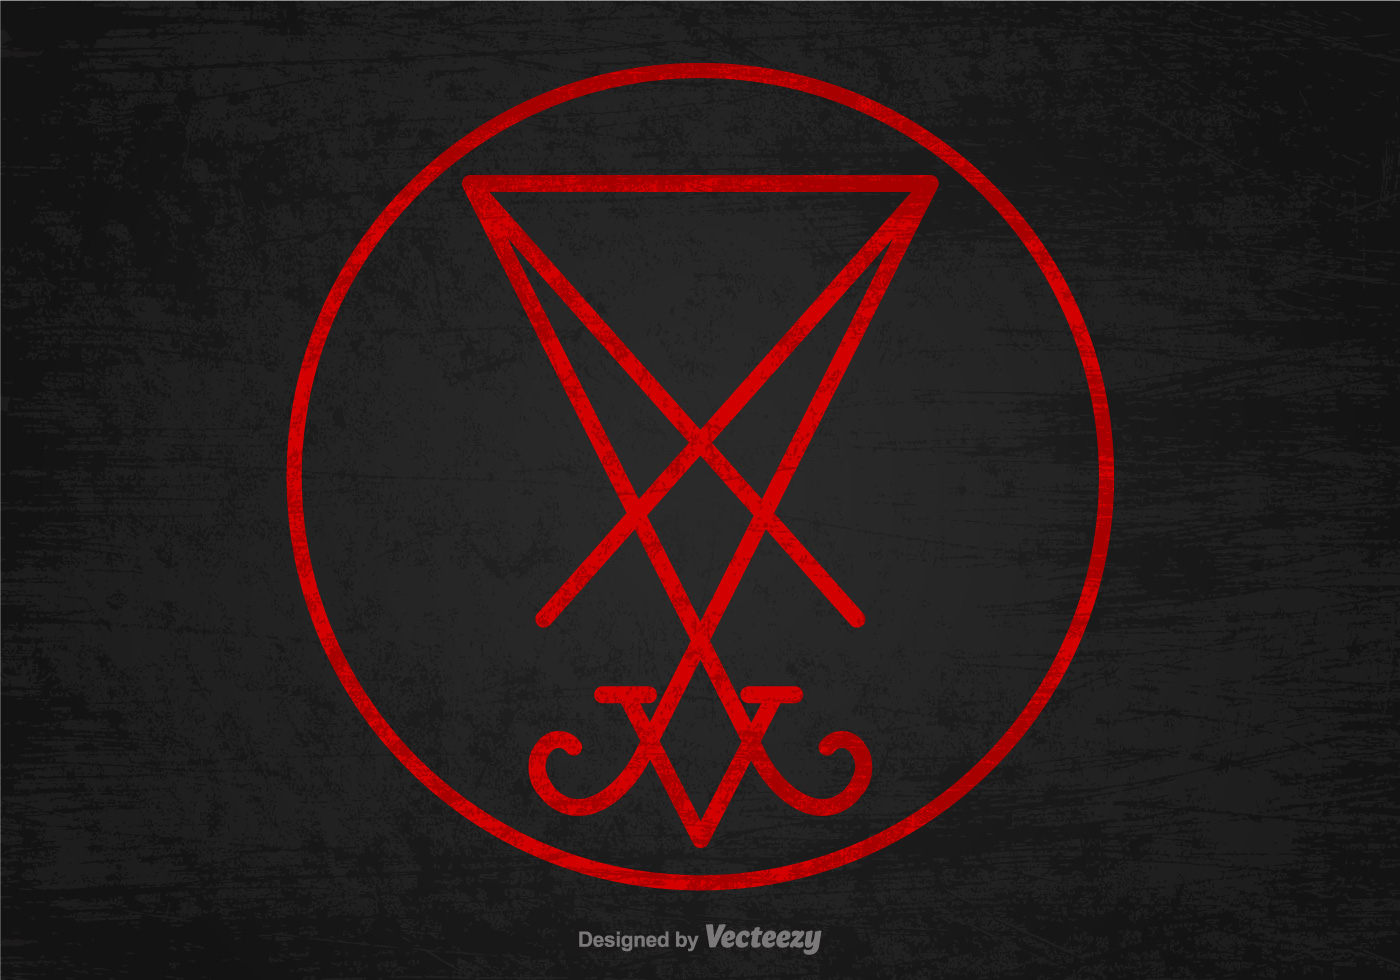 Sigil of satan symbol vector download free vector art stock sigil of satan symbol vector download free vector art stock graphics images buycottarizona